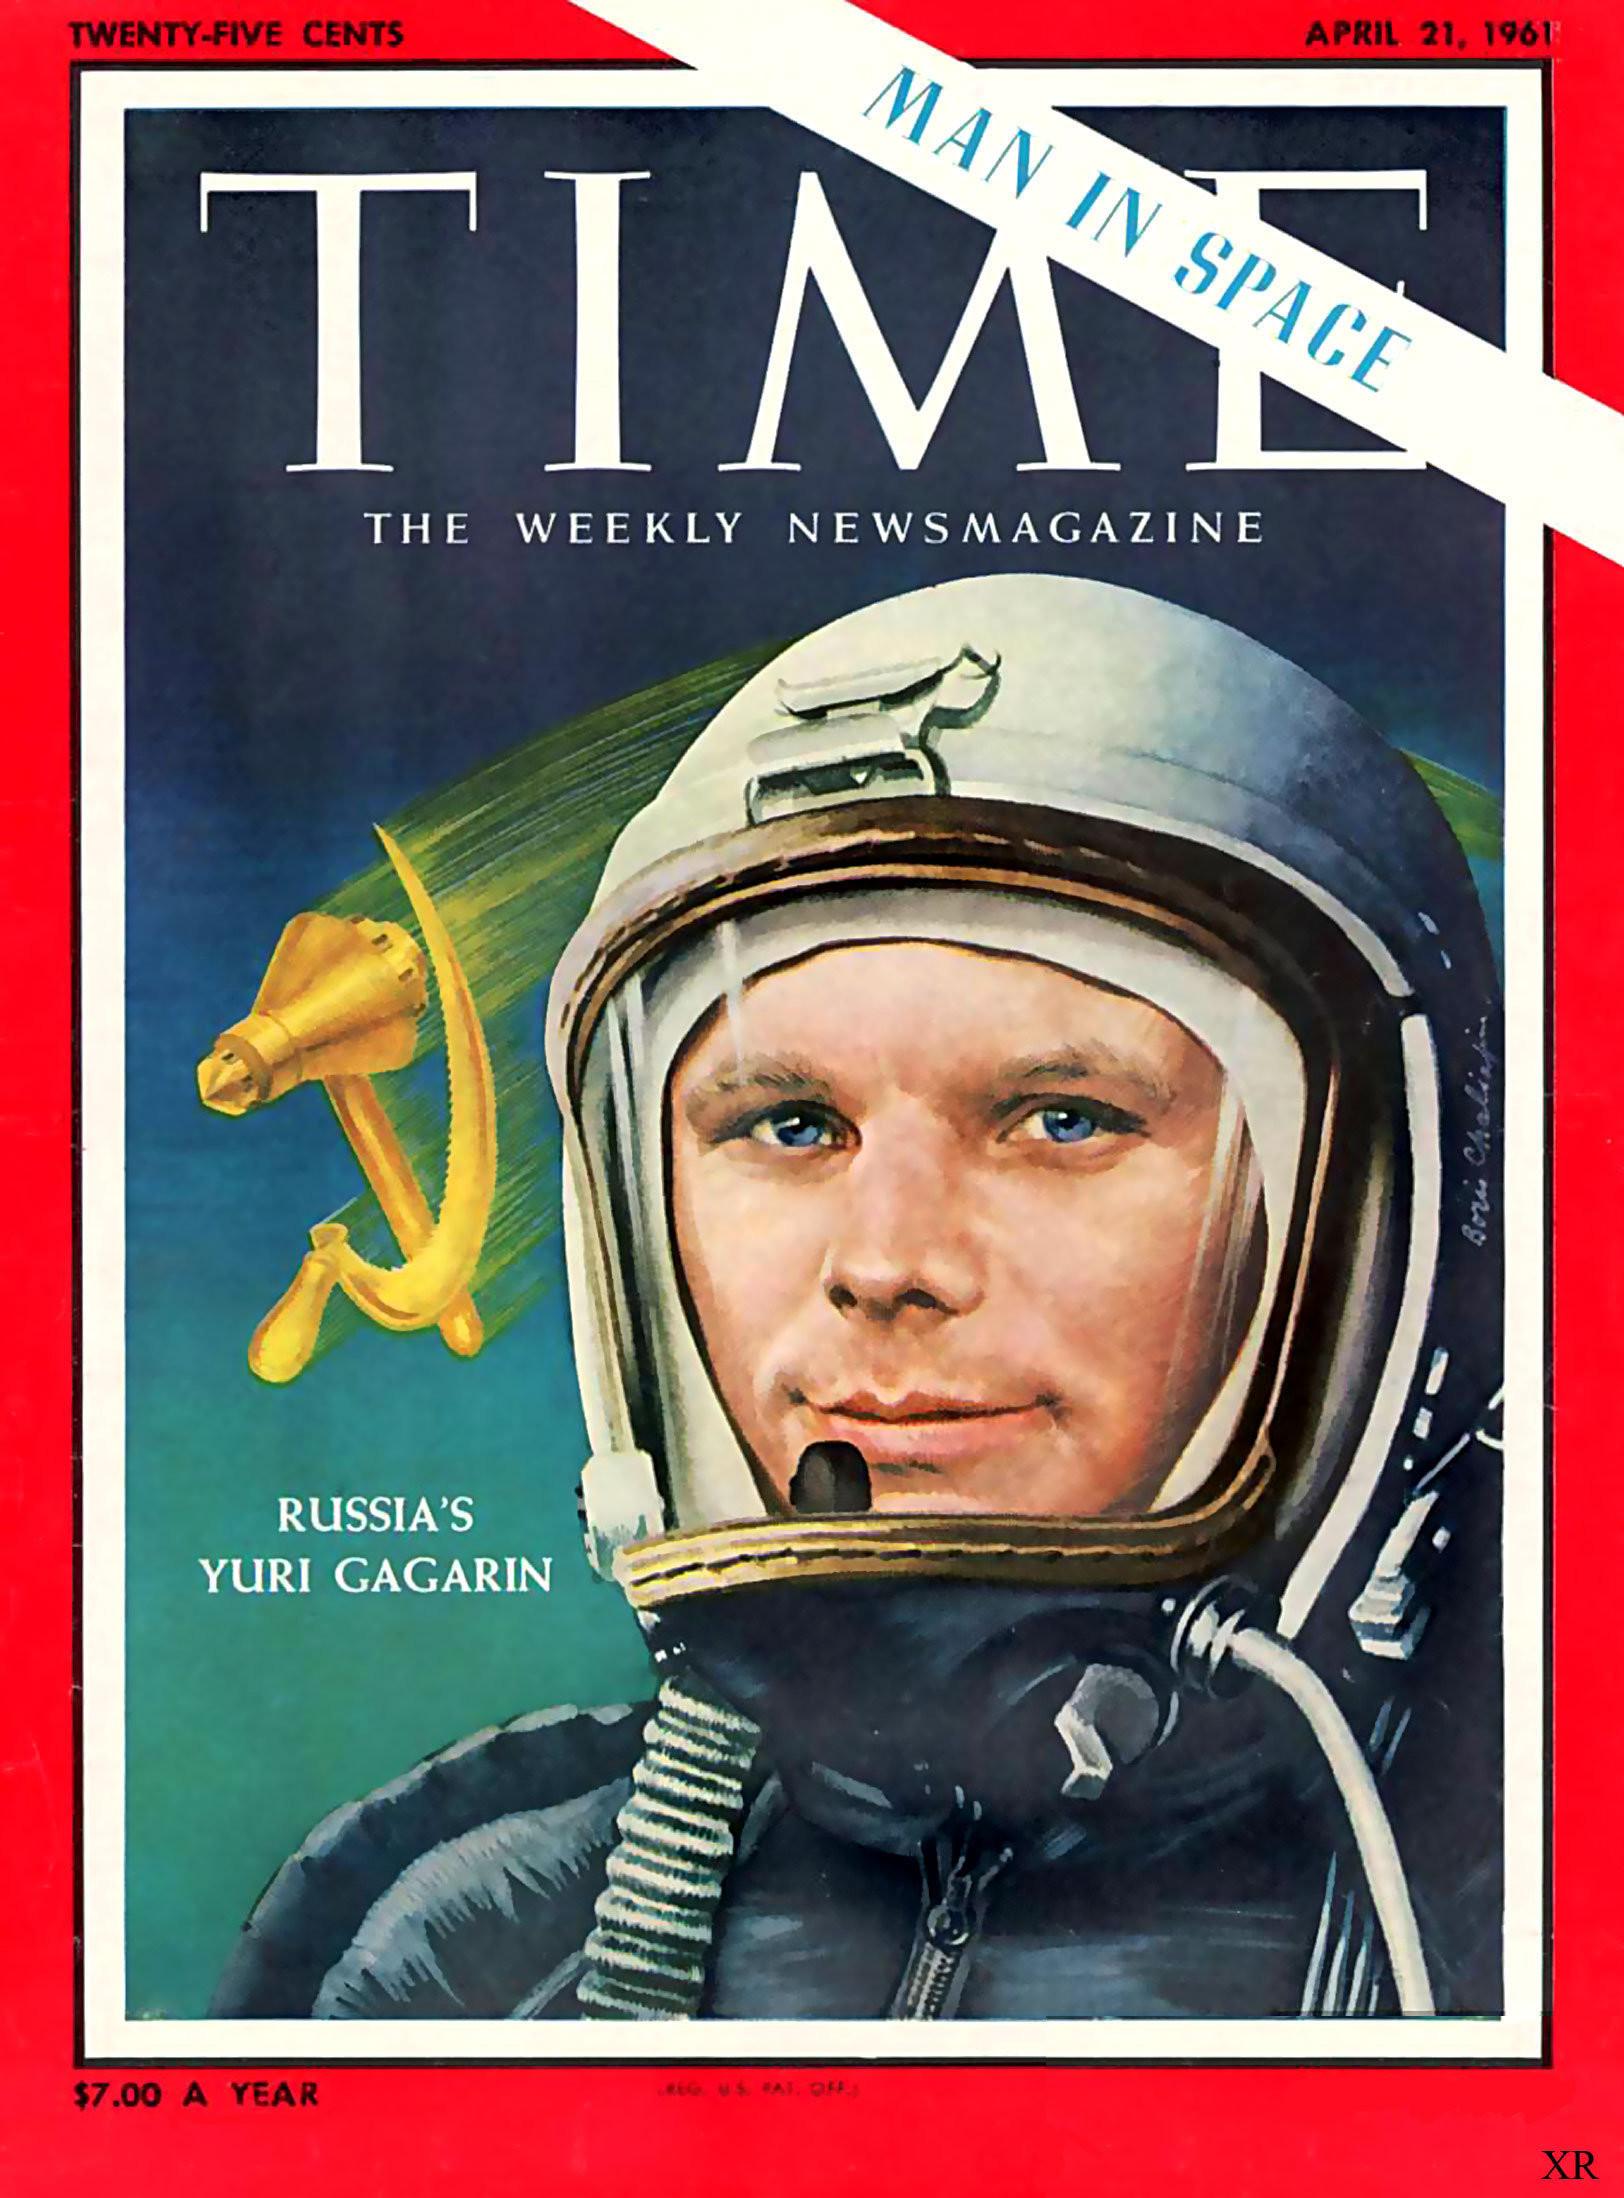 Russia's Yuri Gagarin, Time Magazine, April 21, 1961